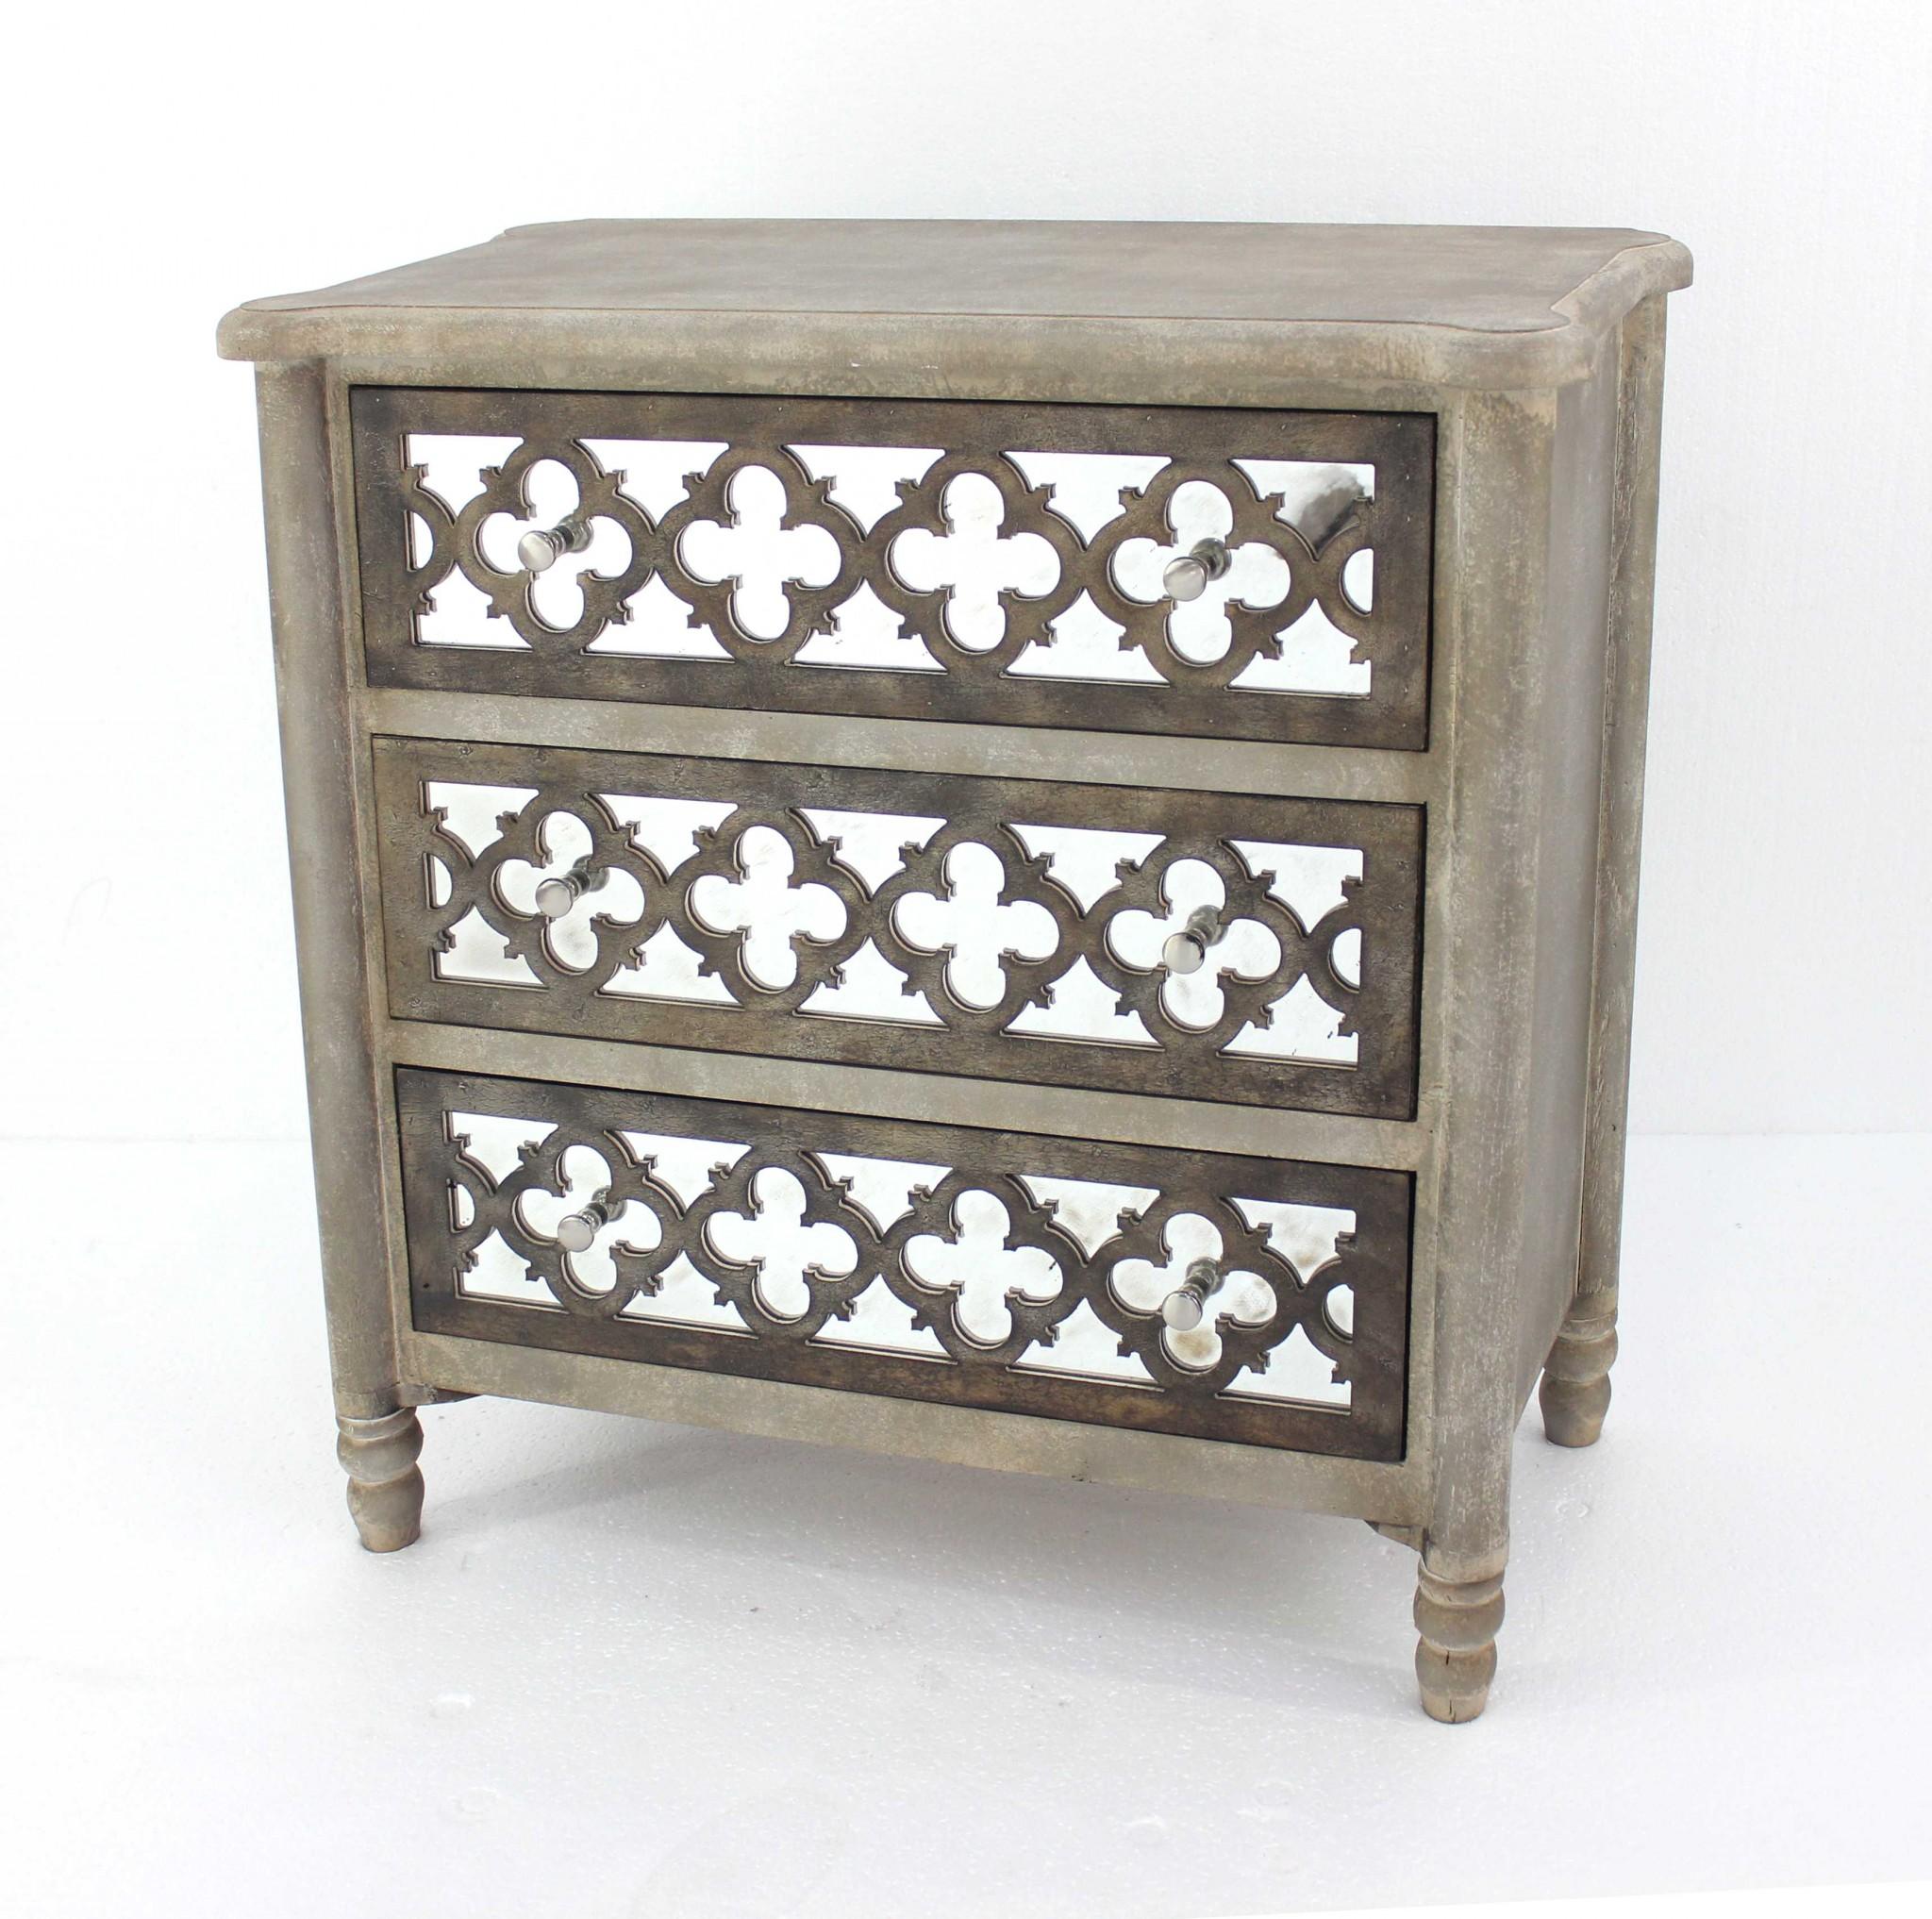 "15"" x 32"" x 32"" Brown, 3 Drawer, Wood, Mirror - Cabinet"